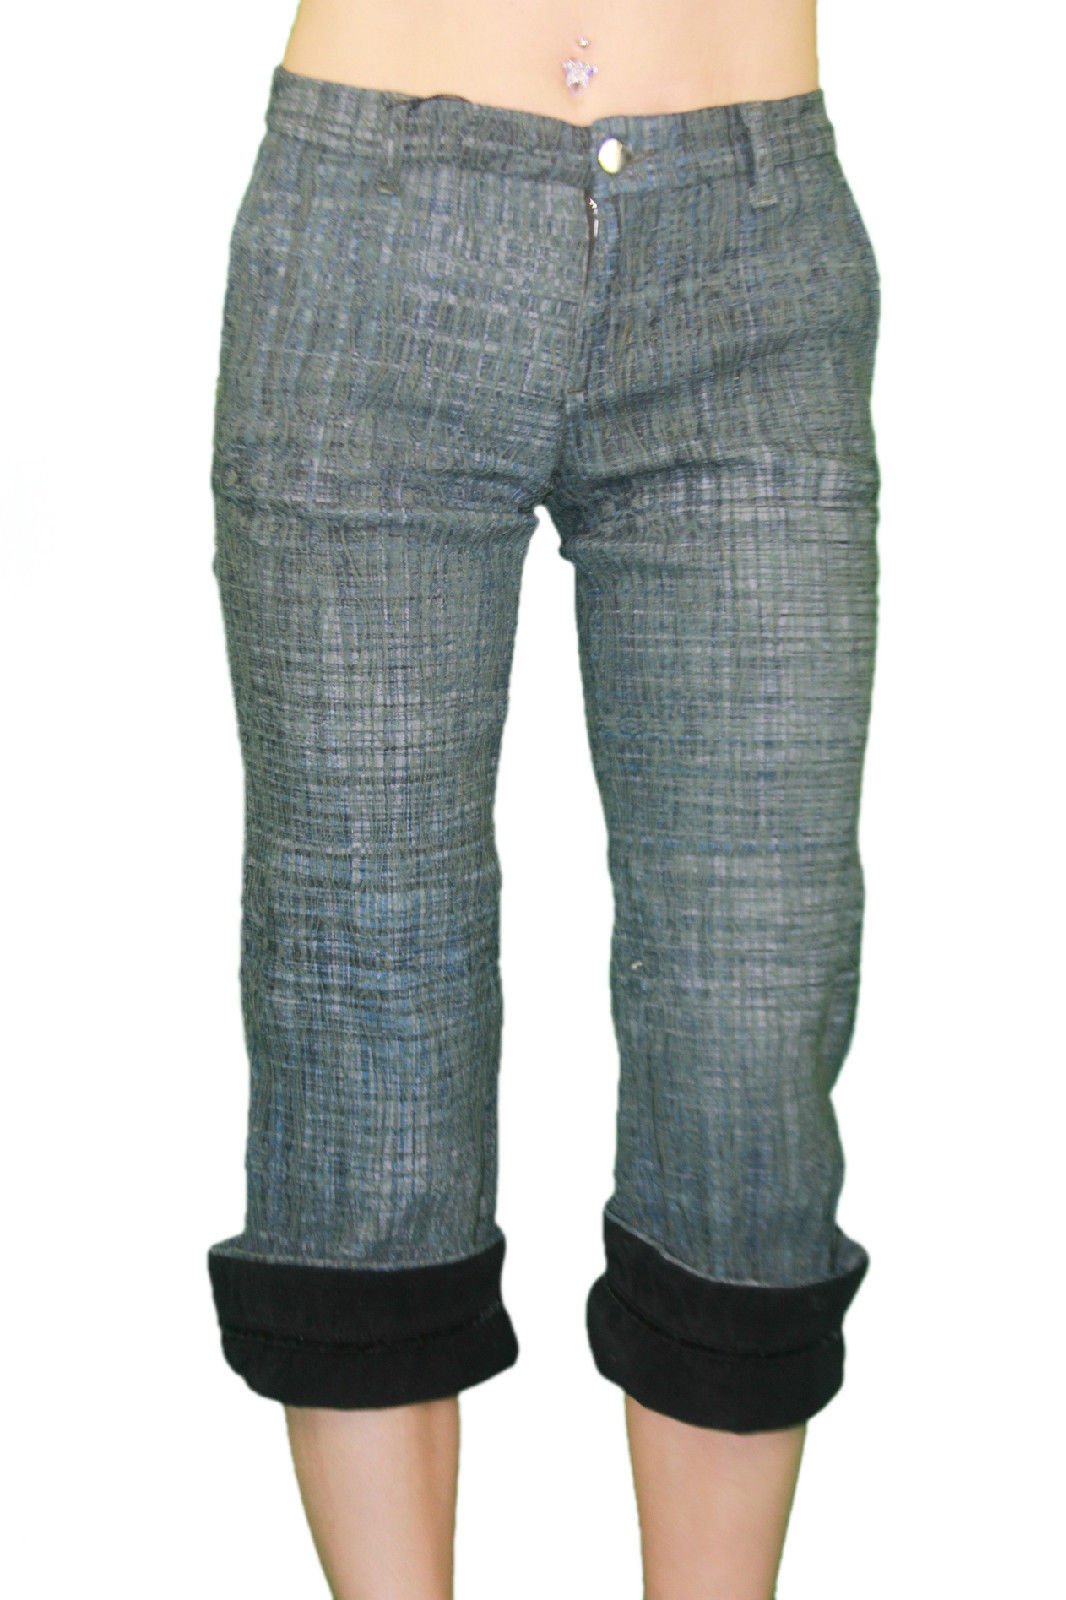 CUSTO BARCELONA Women/'s King Fu Cropped Capris Pants 593044 $174 NWT